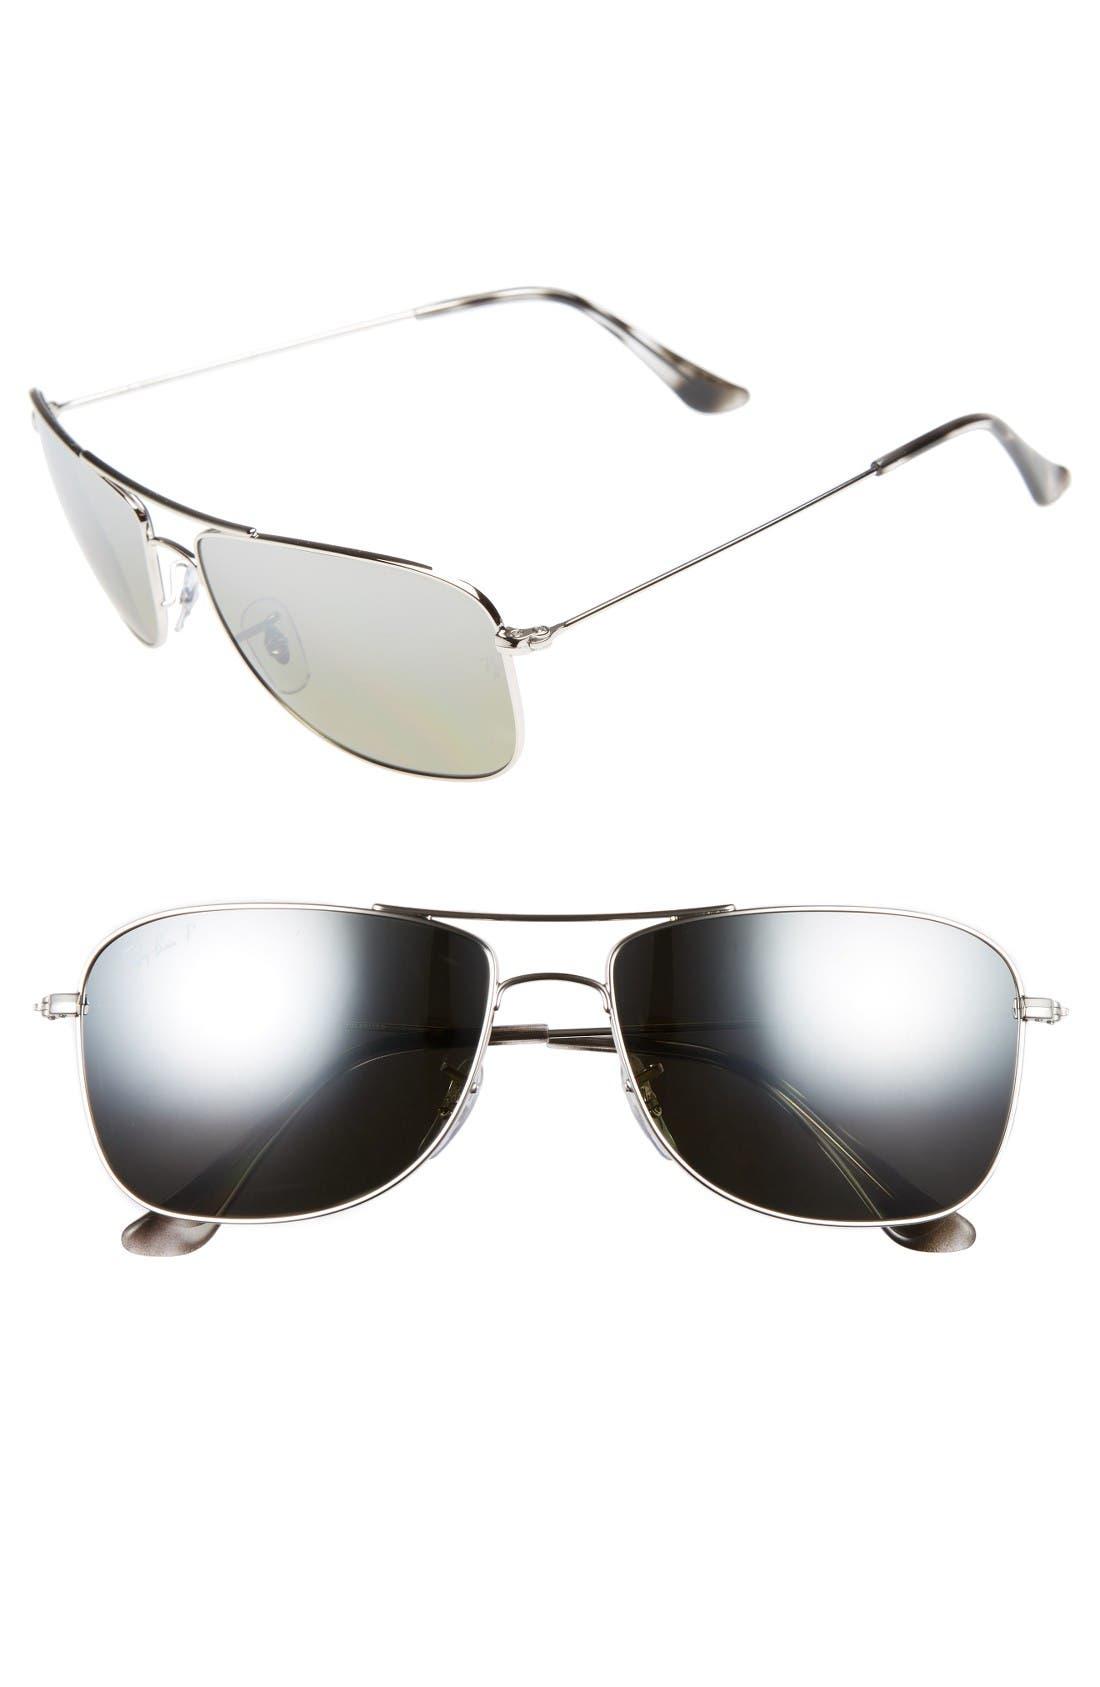 59mm Chromance Aviator Sunglasses,                         Main,                         color, Shiny Silver/Grey Mirror